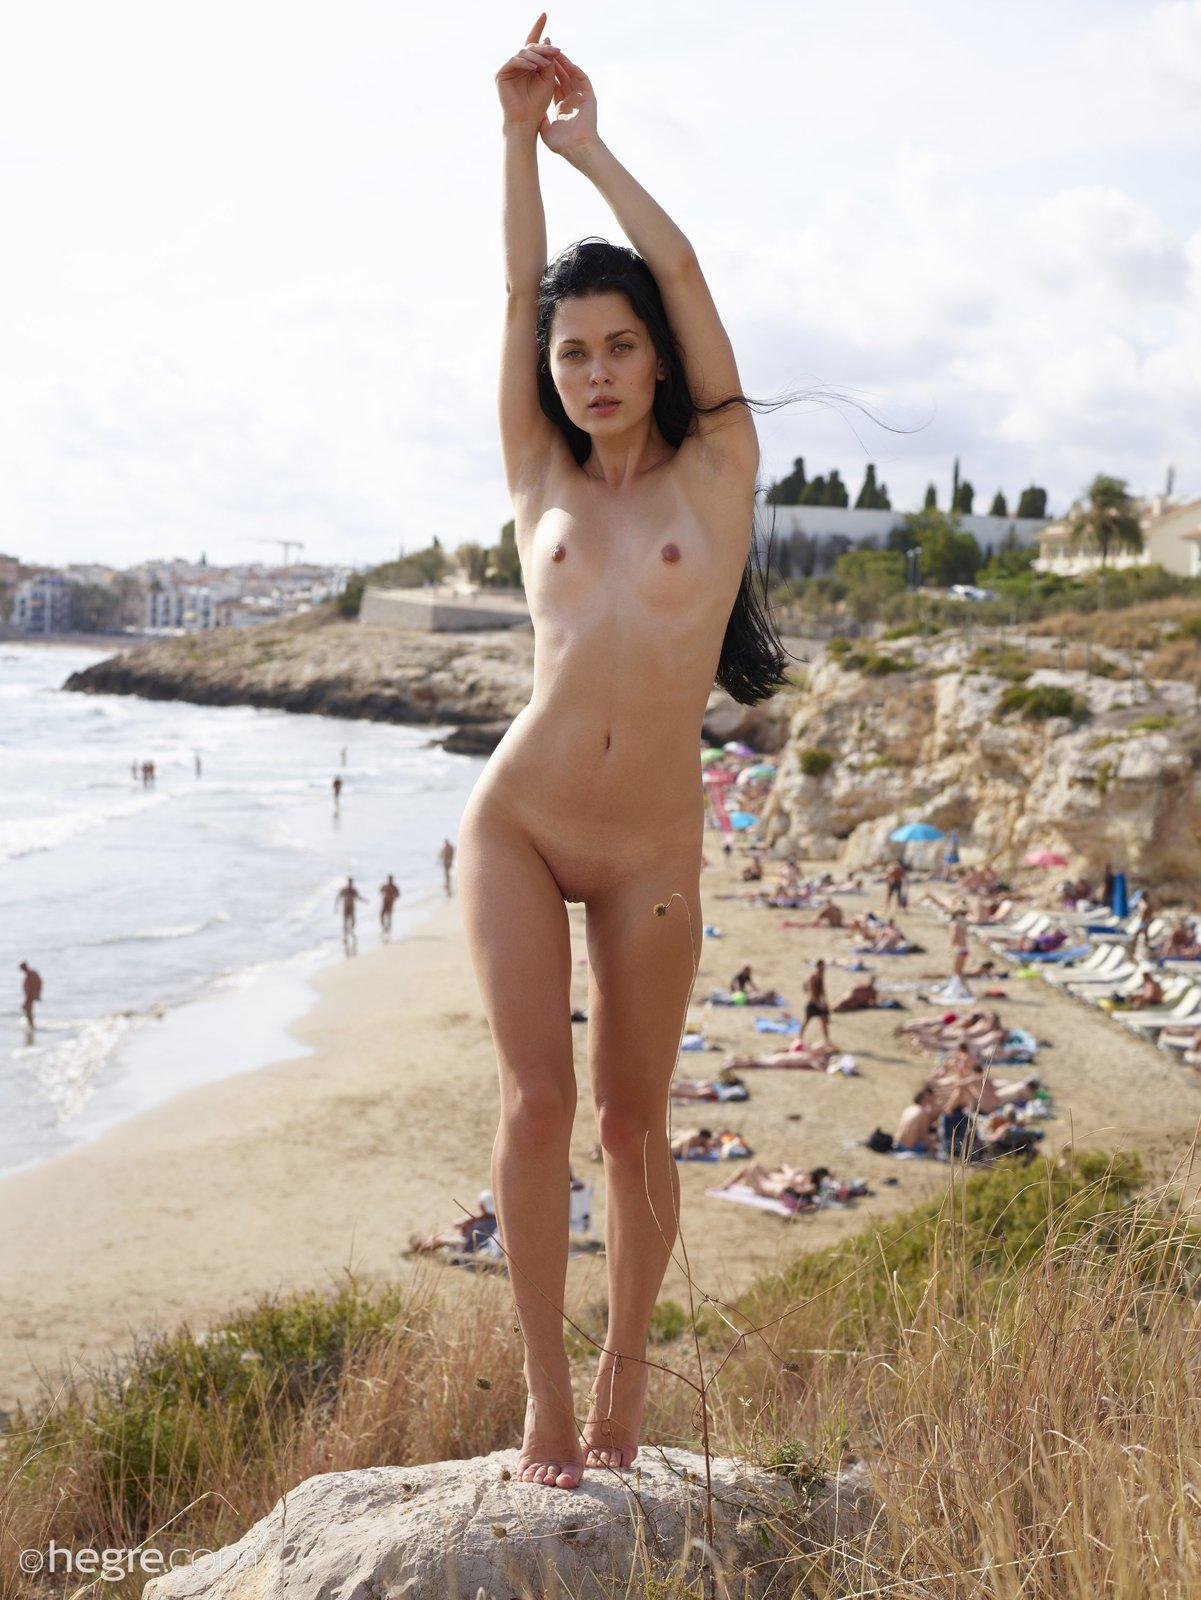 Belle In Public Nudity By Hegre-Art 12 Photos  Erotic -9896